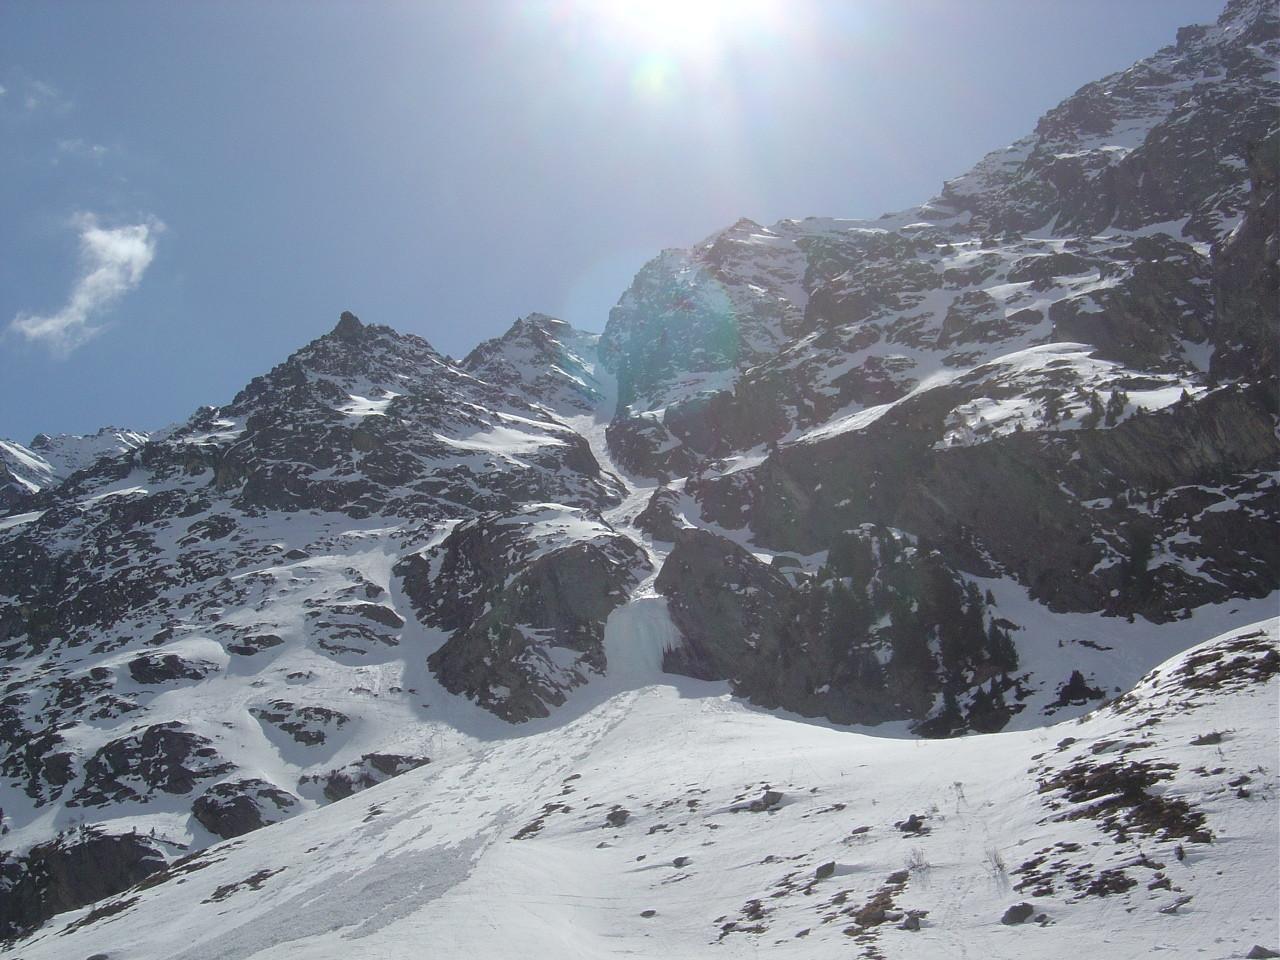 Le Grand Couloir NE de la Serre de Vuibé vu des pistes de fond du val d'Arolla.